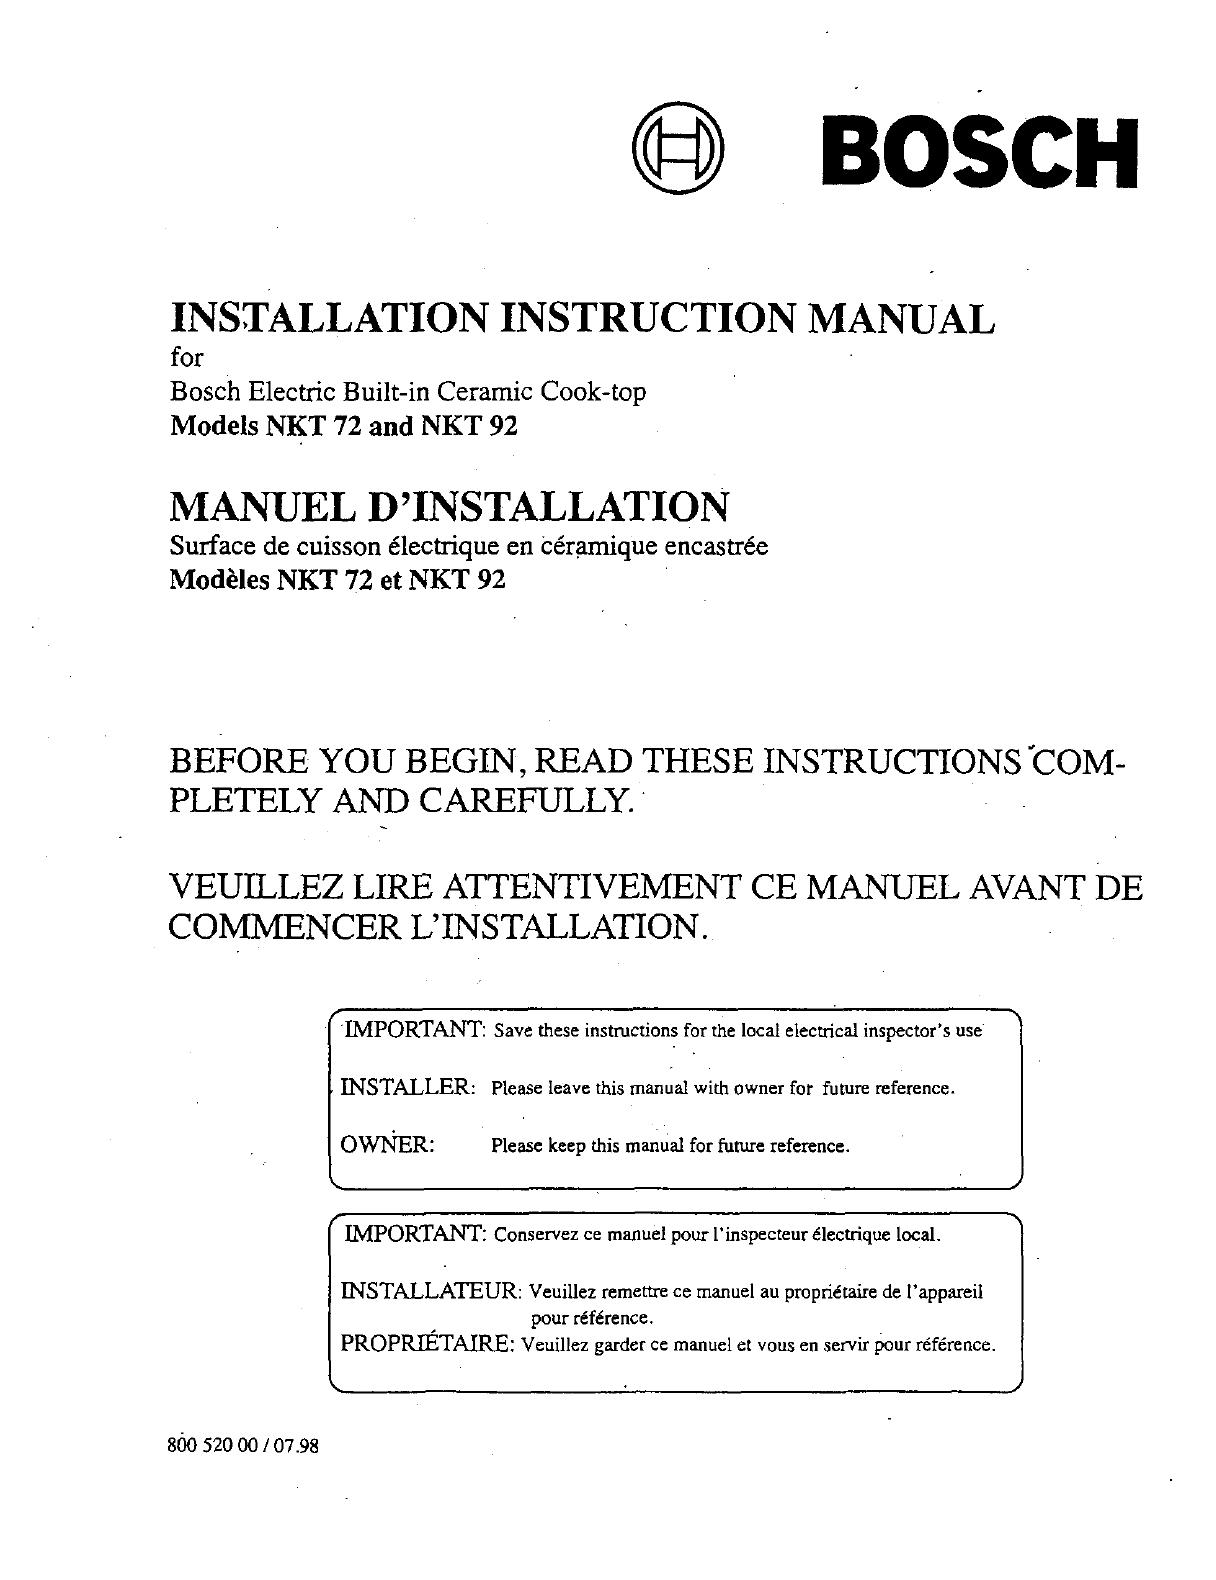 Bosch Appliances Nkt 72 92 Instruction Manual Refrigerator Wiring Schematic